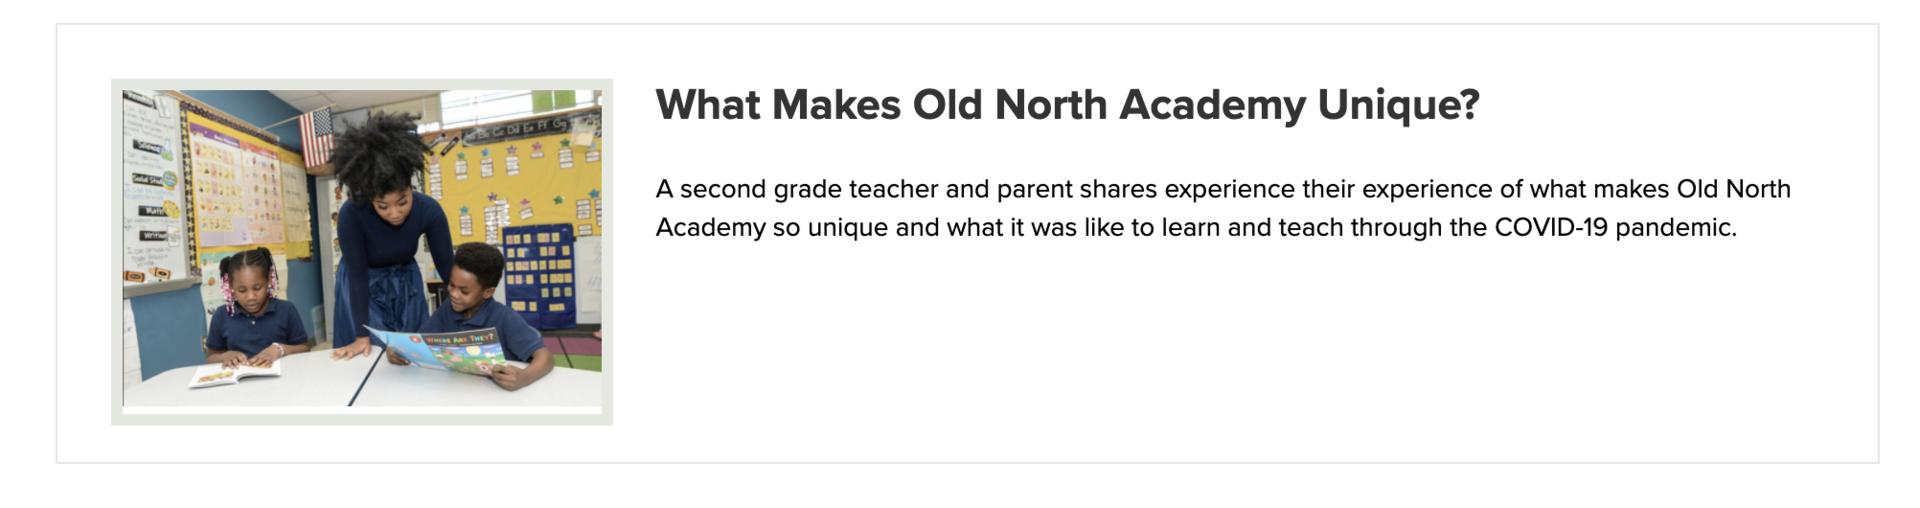 old north academy confluence academies